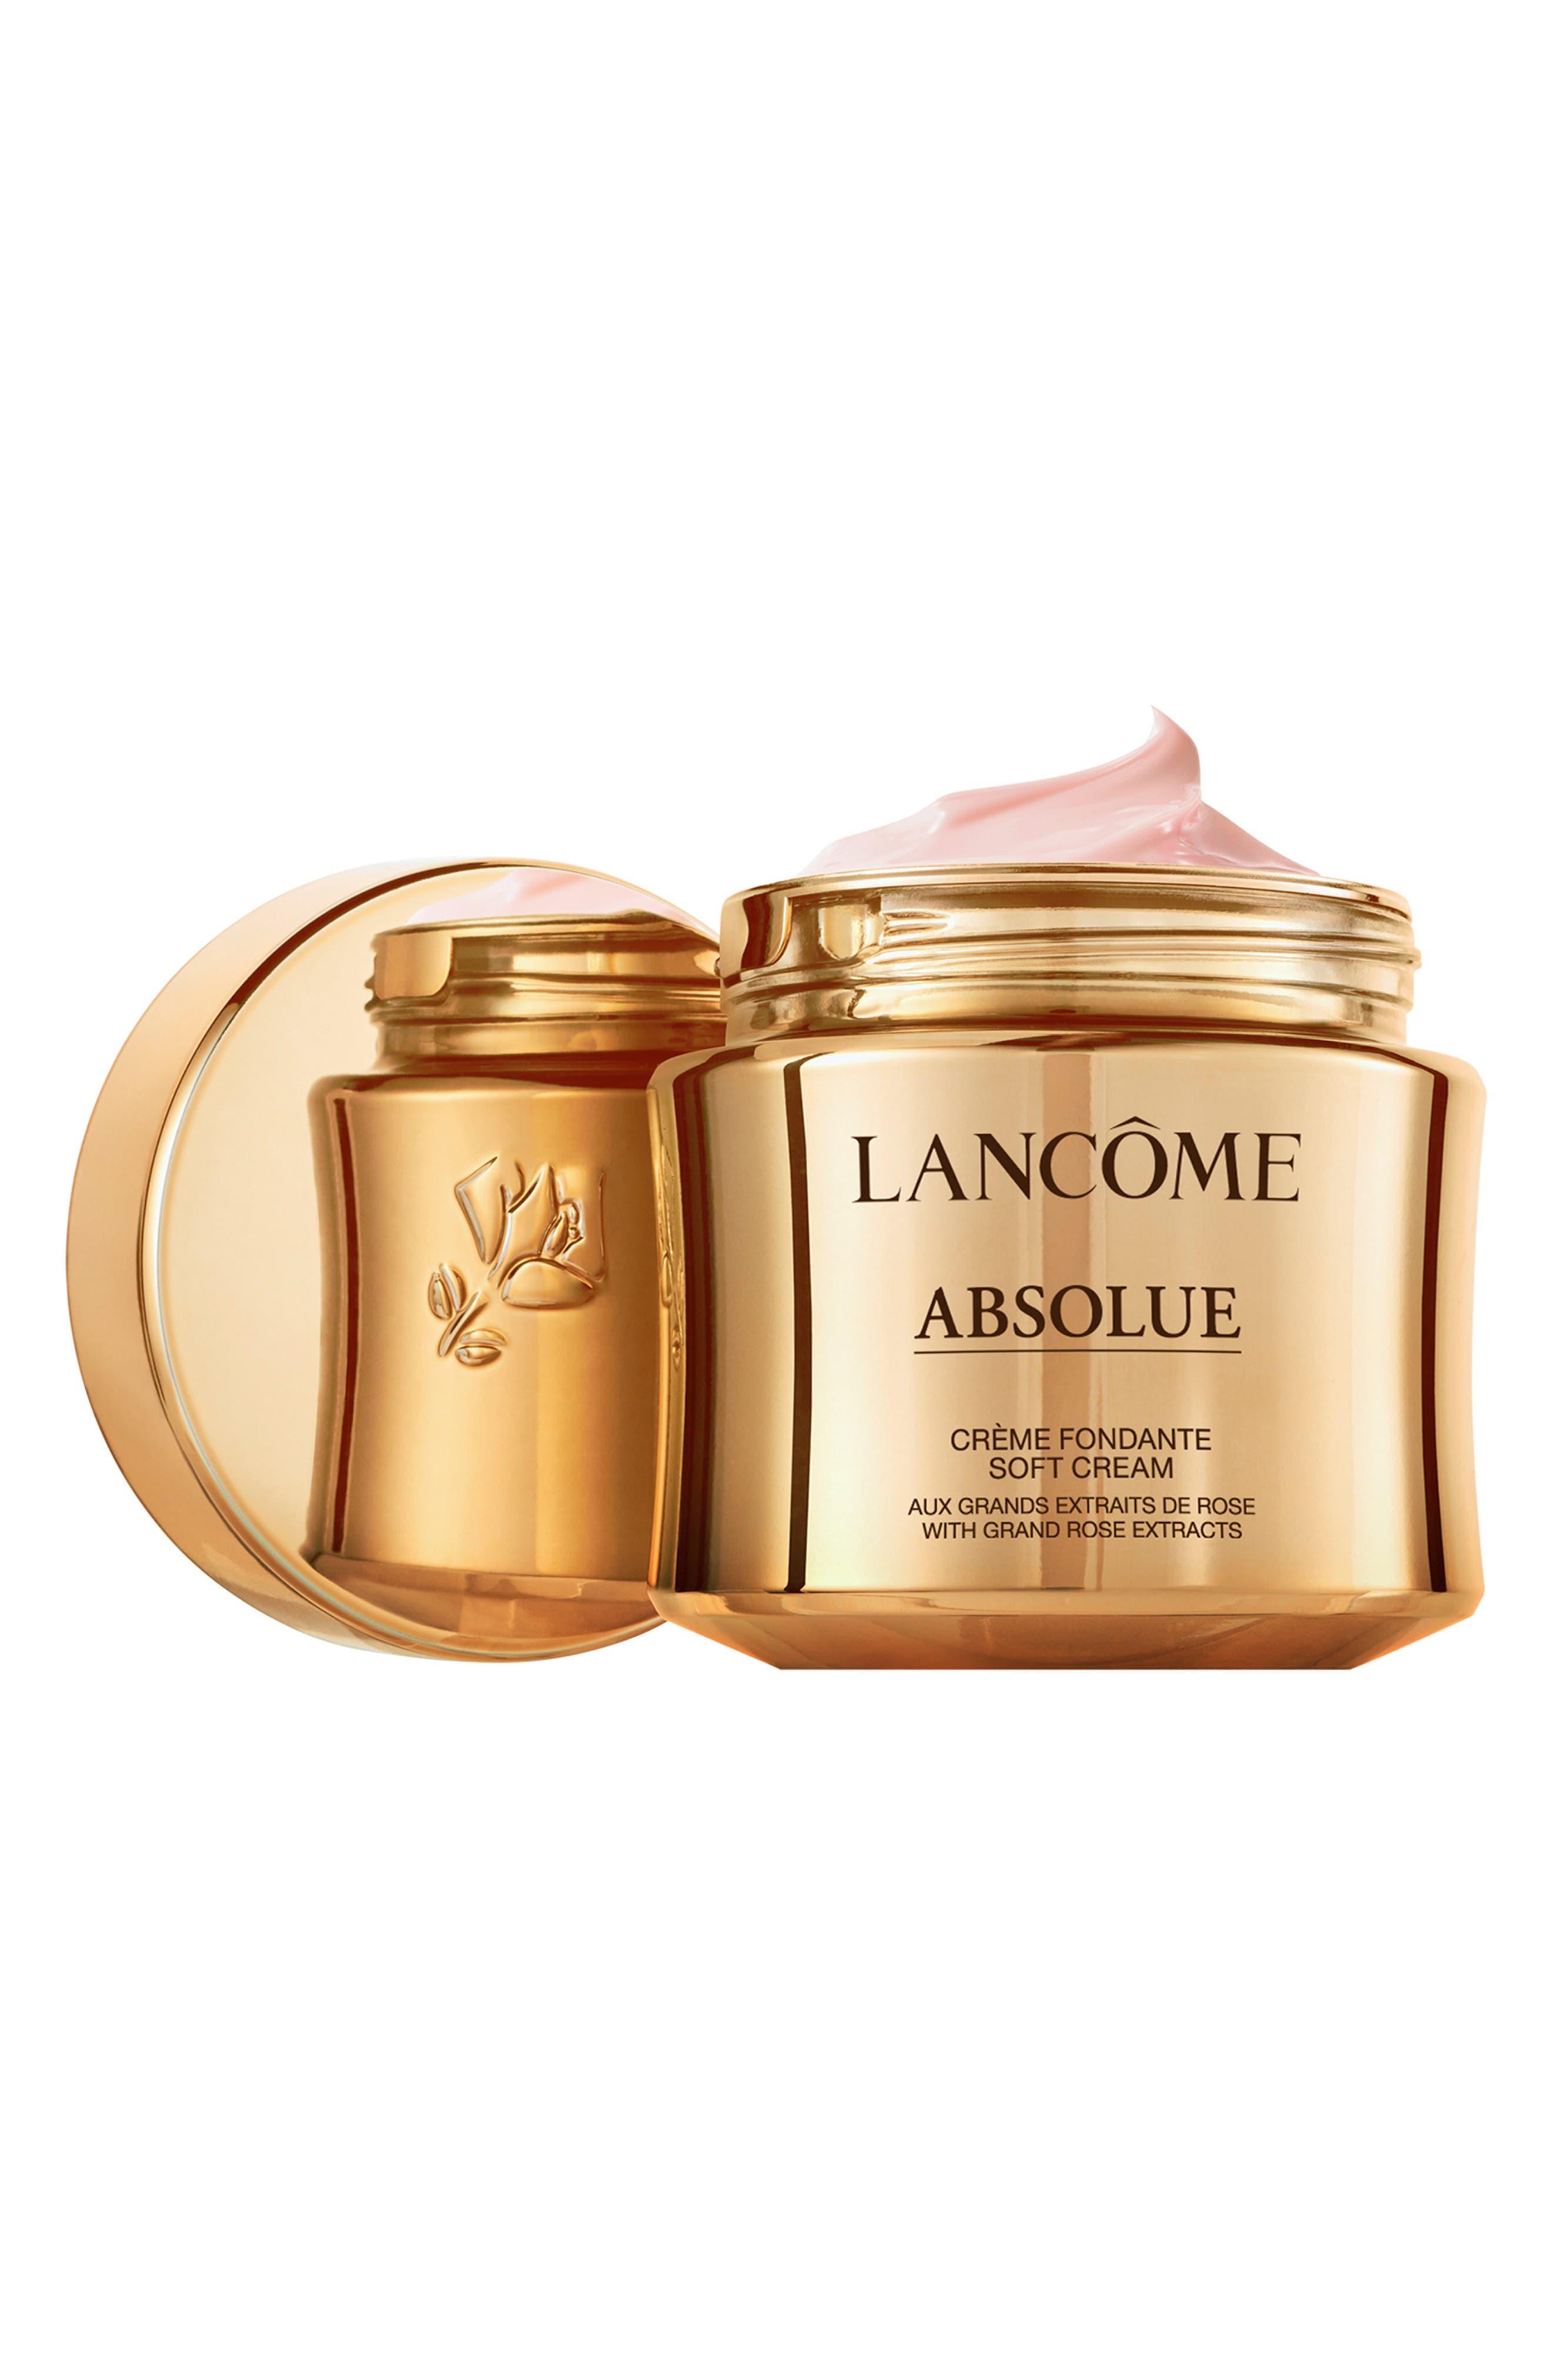 LANCÔME, Absolue Revitalizing & Brightening Soft Cream, Main thumbnail 1, color, NO COLOR